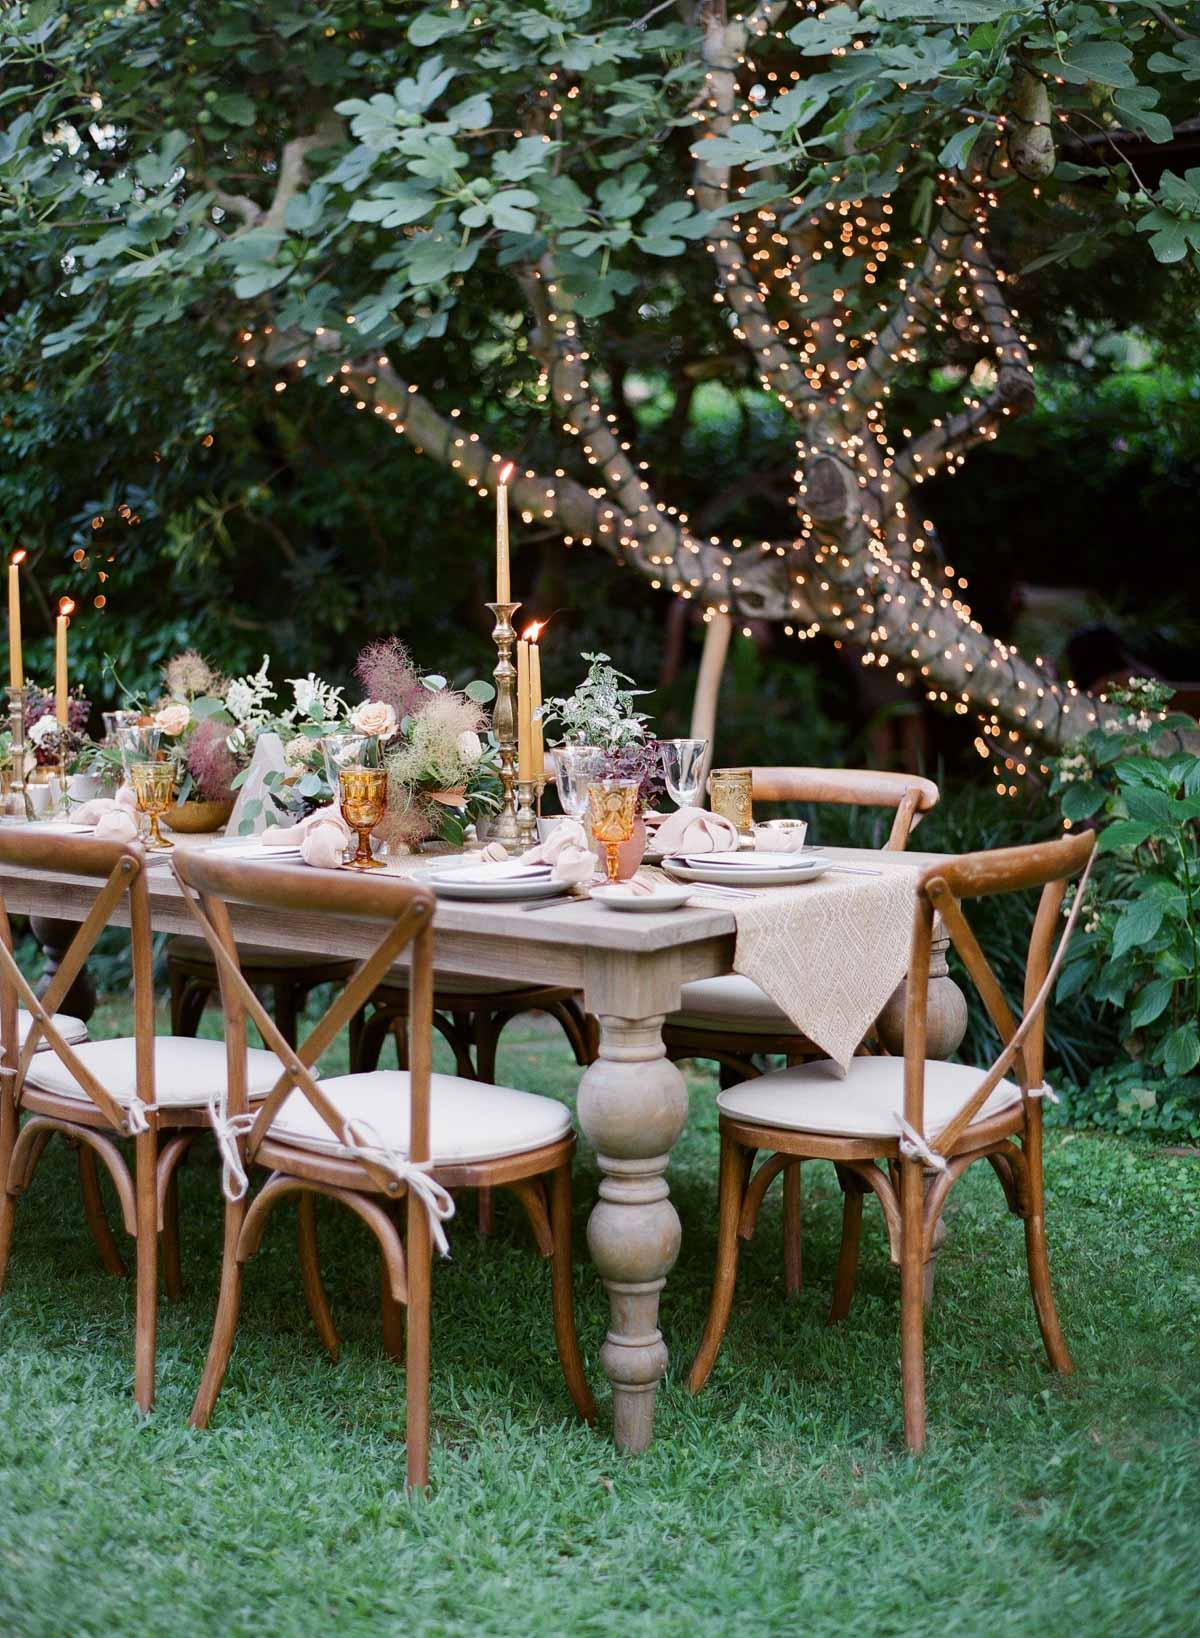 Lauren_Travis_Backyard_California_Wedding (c) Greg_Finck-121.jpg